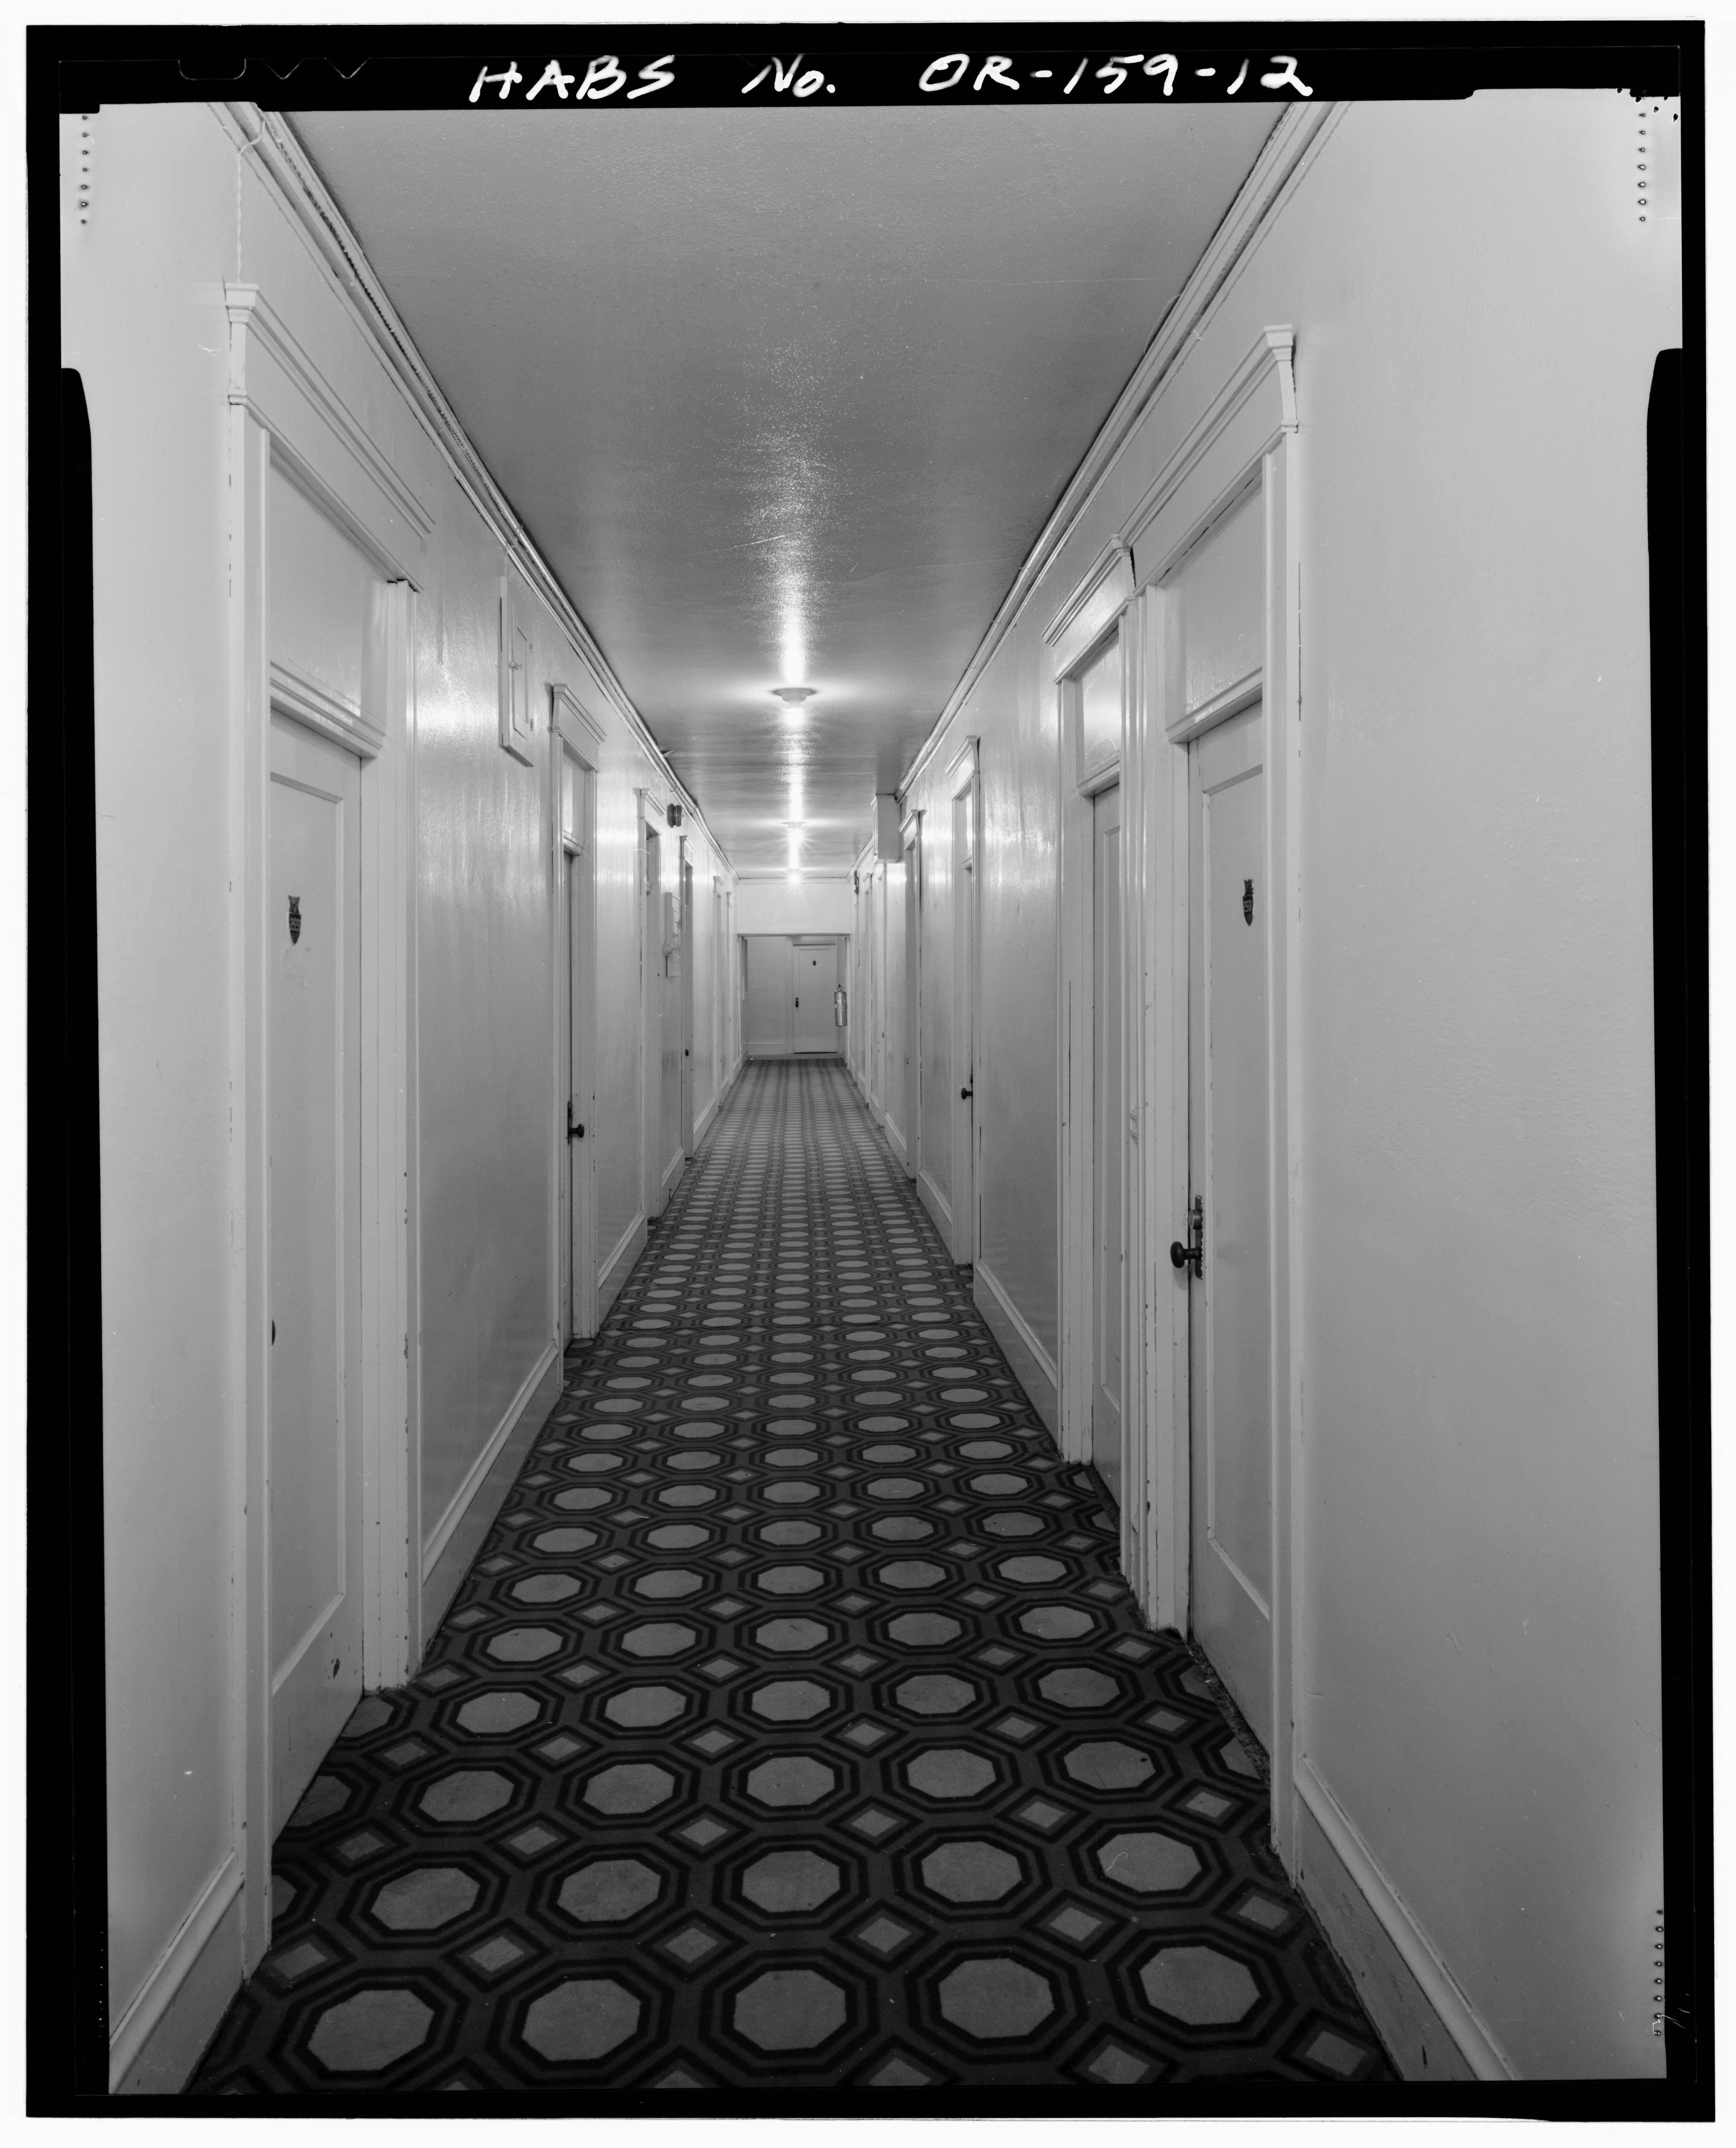 Hamilton Hotel Rooms